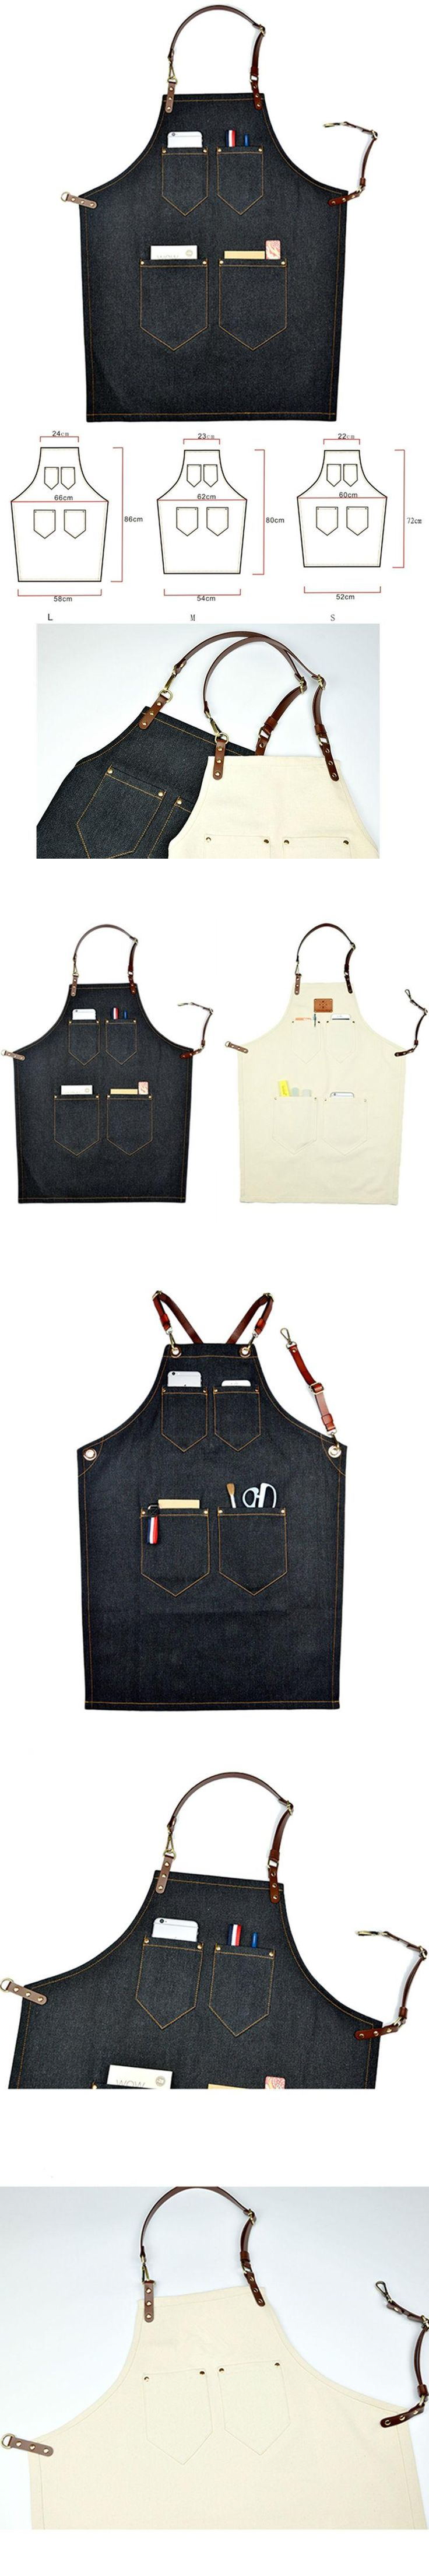 Black Denim/White Canvas Apron w/Leather Straps Barber Barista Florist Cafe Chef Uniform Bistro Baker Craft-men Workwear K49